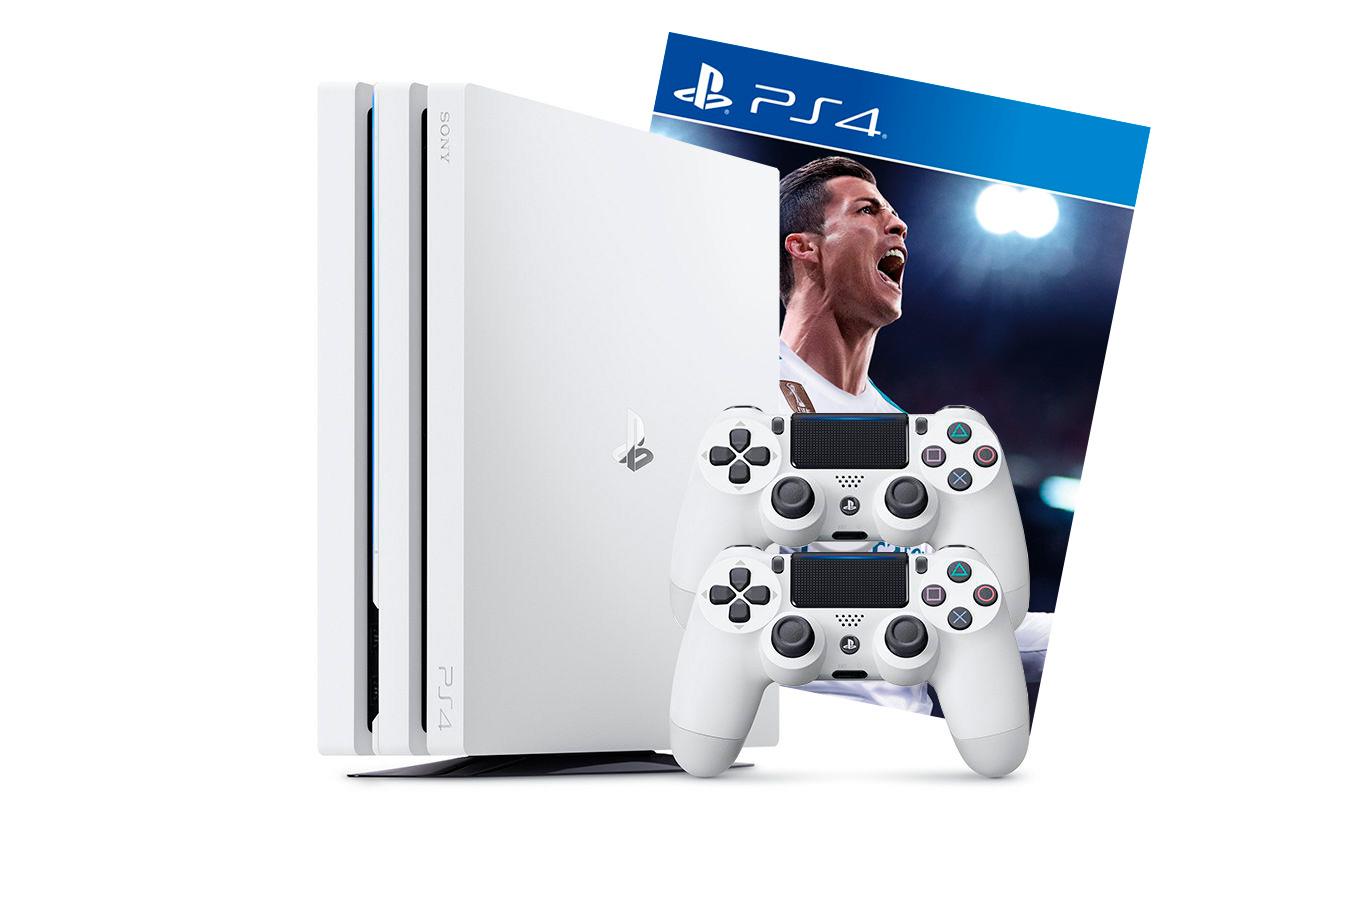 PlayStation 4 Pro 1Tb 2 джойстика, белая приставка и игра FIFA 18 [PS4P1WJ2F18]